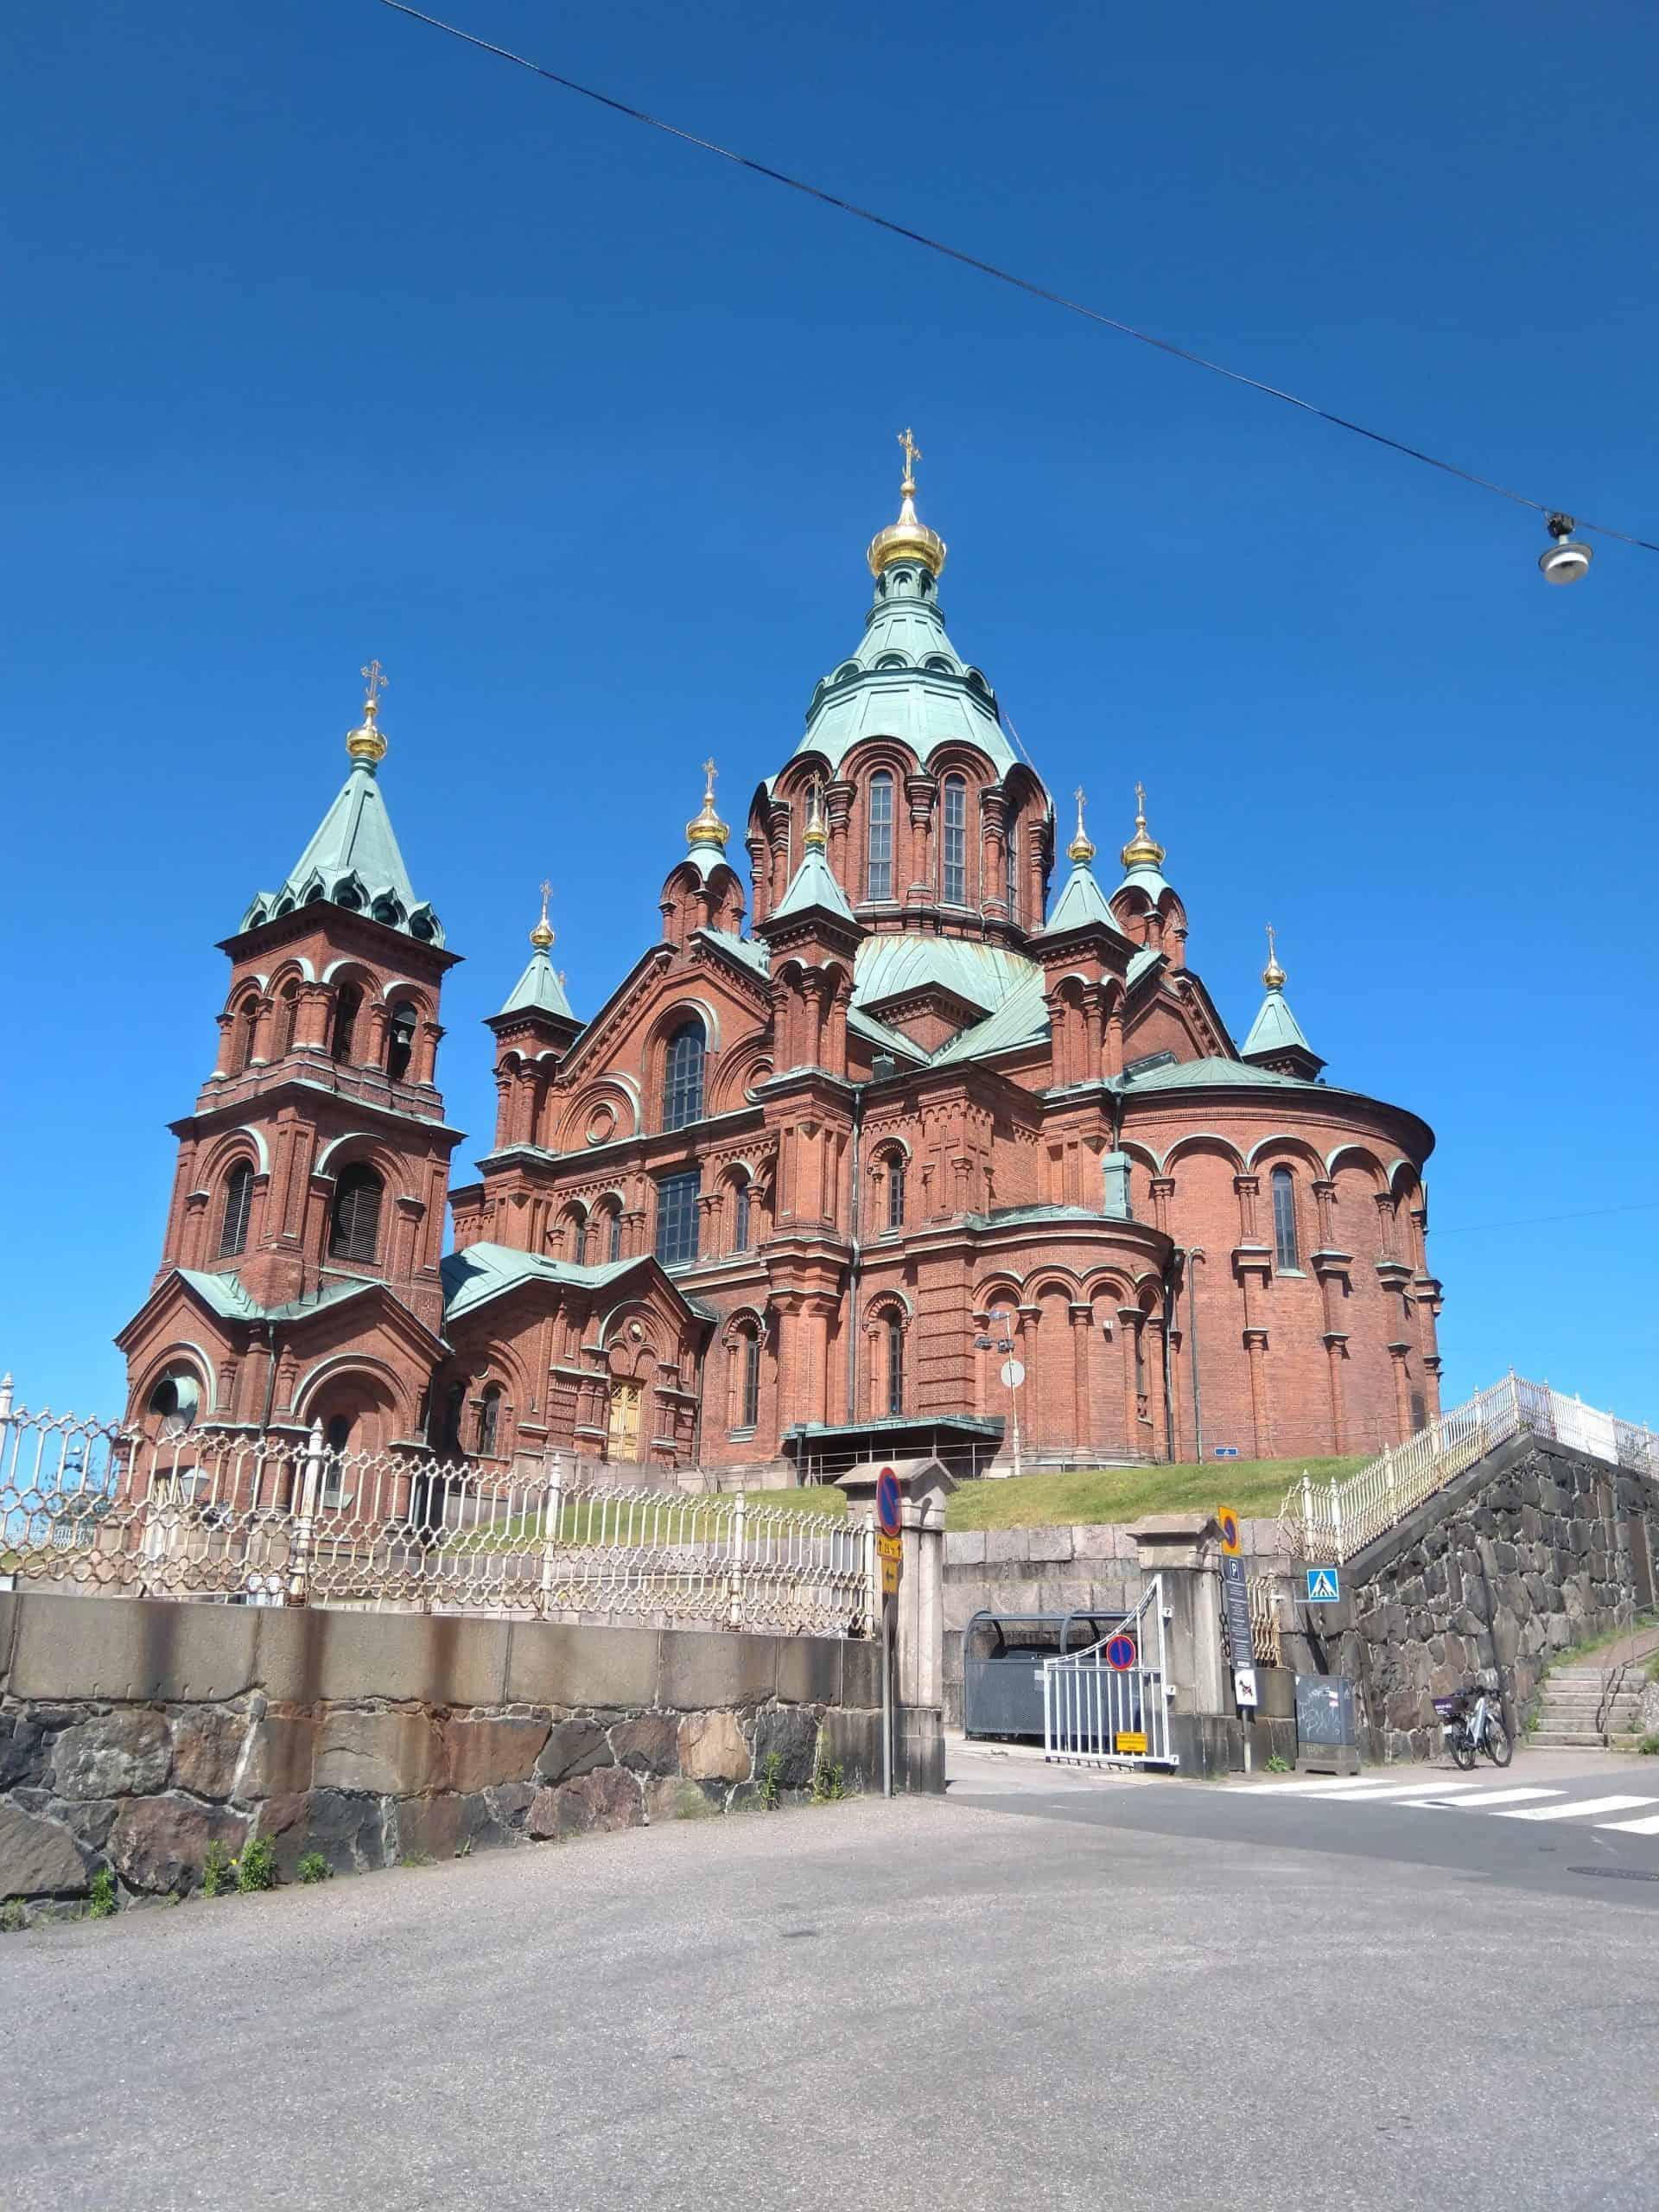 Helsinkitour_tourpoint12_uspenskycathedral